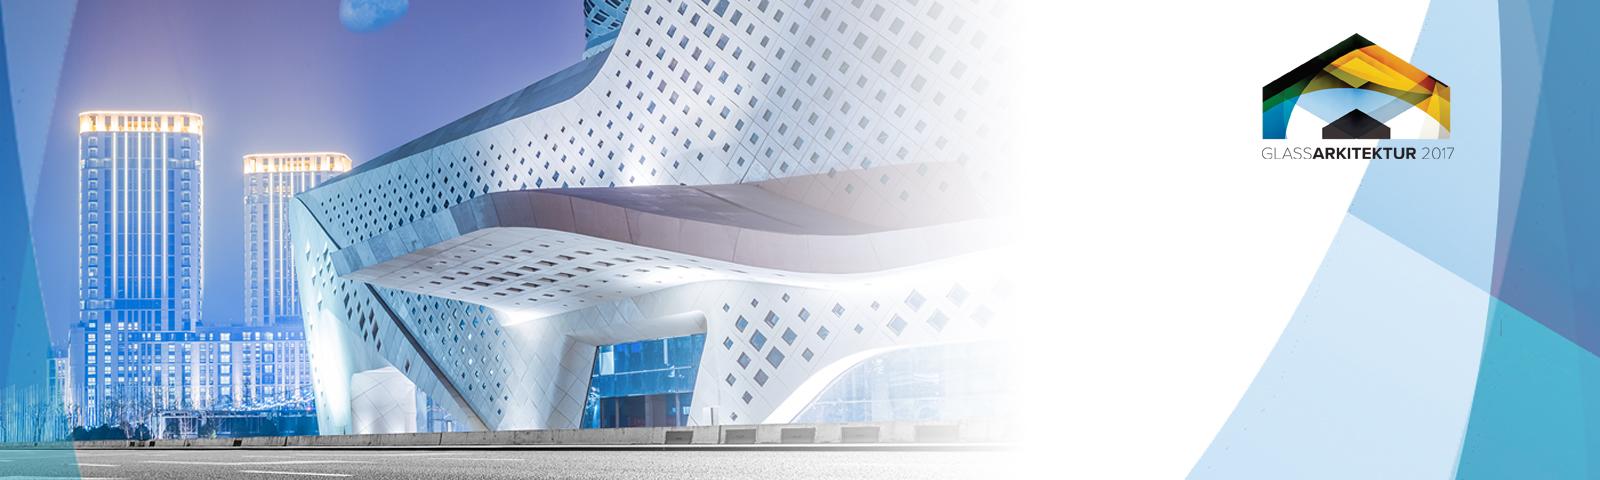 Glassarkitektur 2017